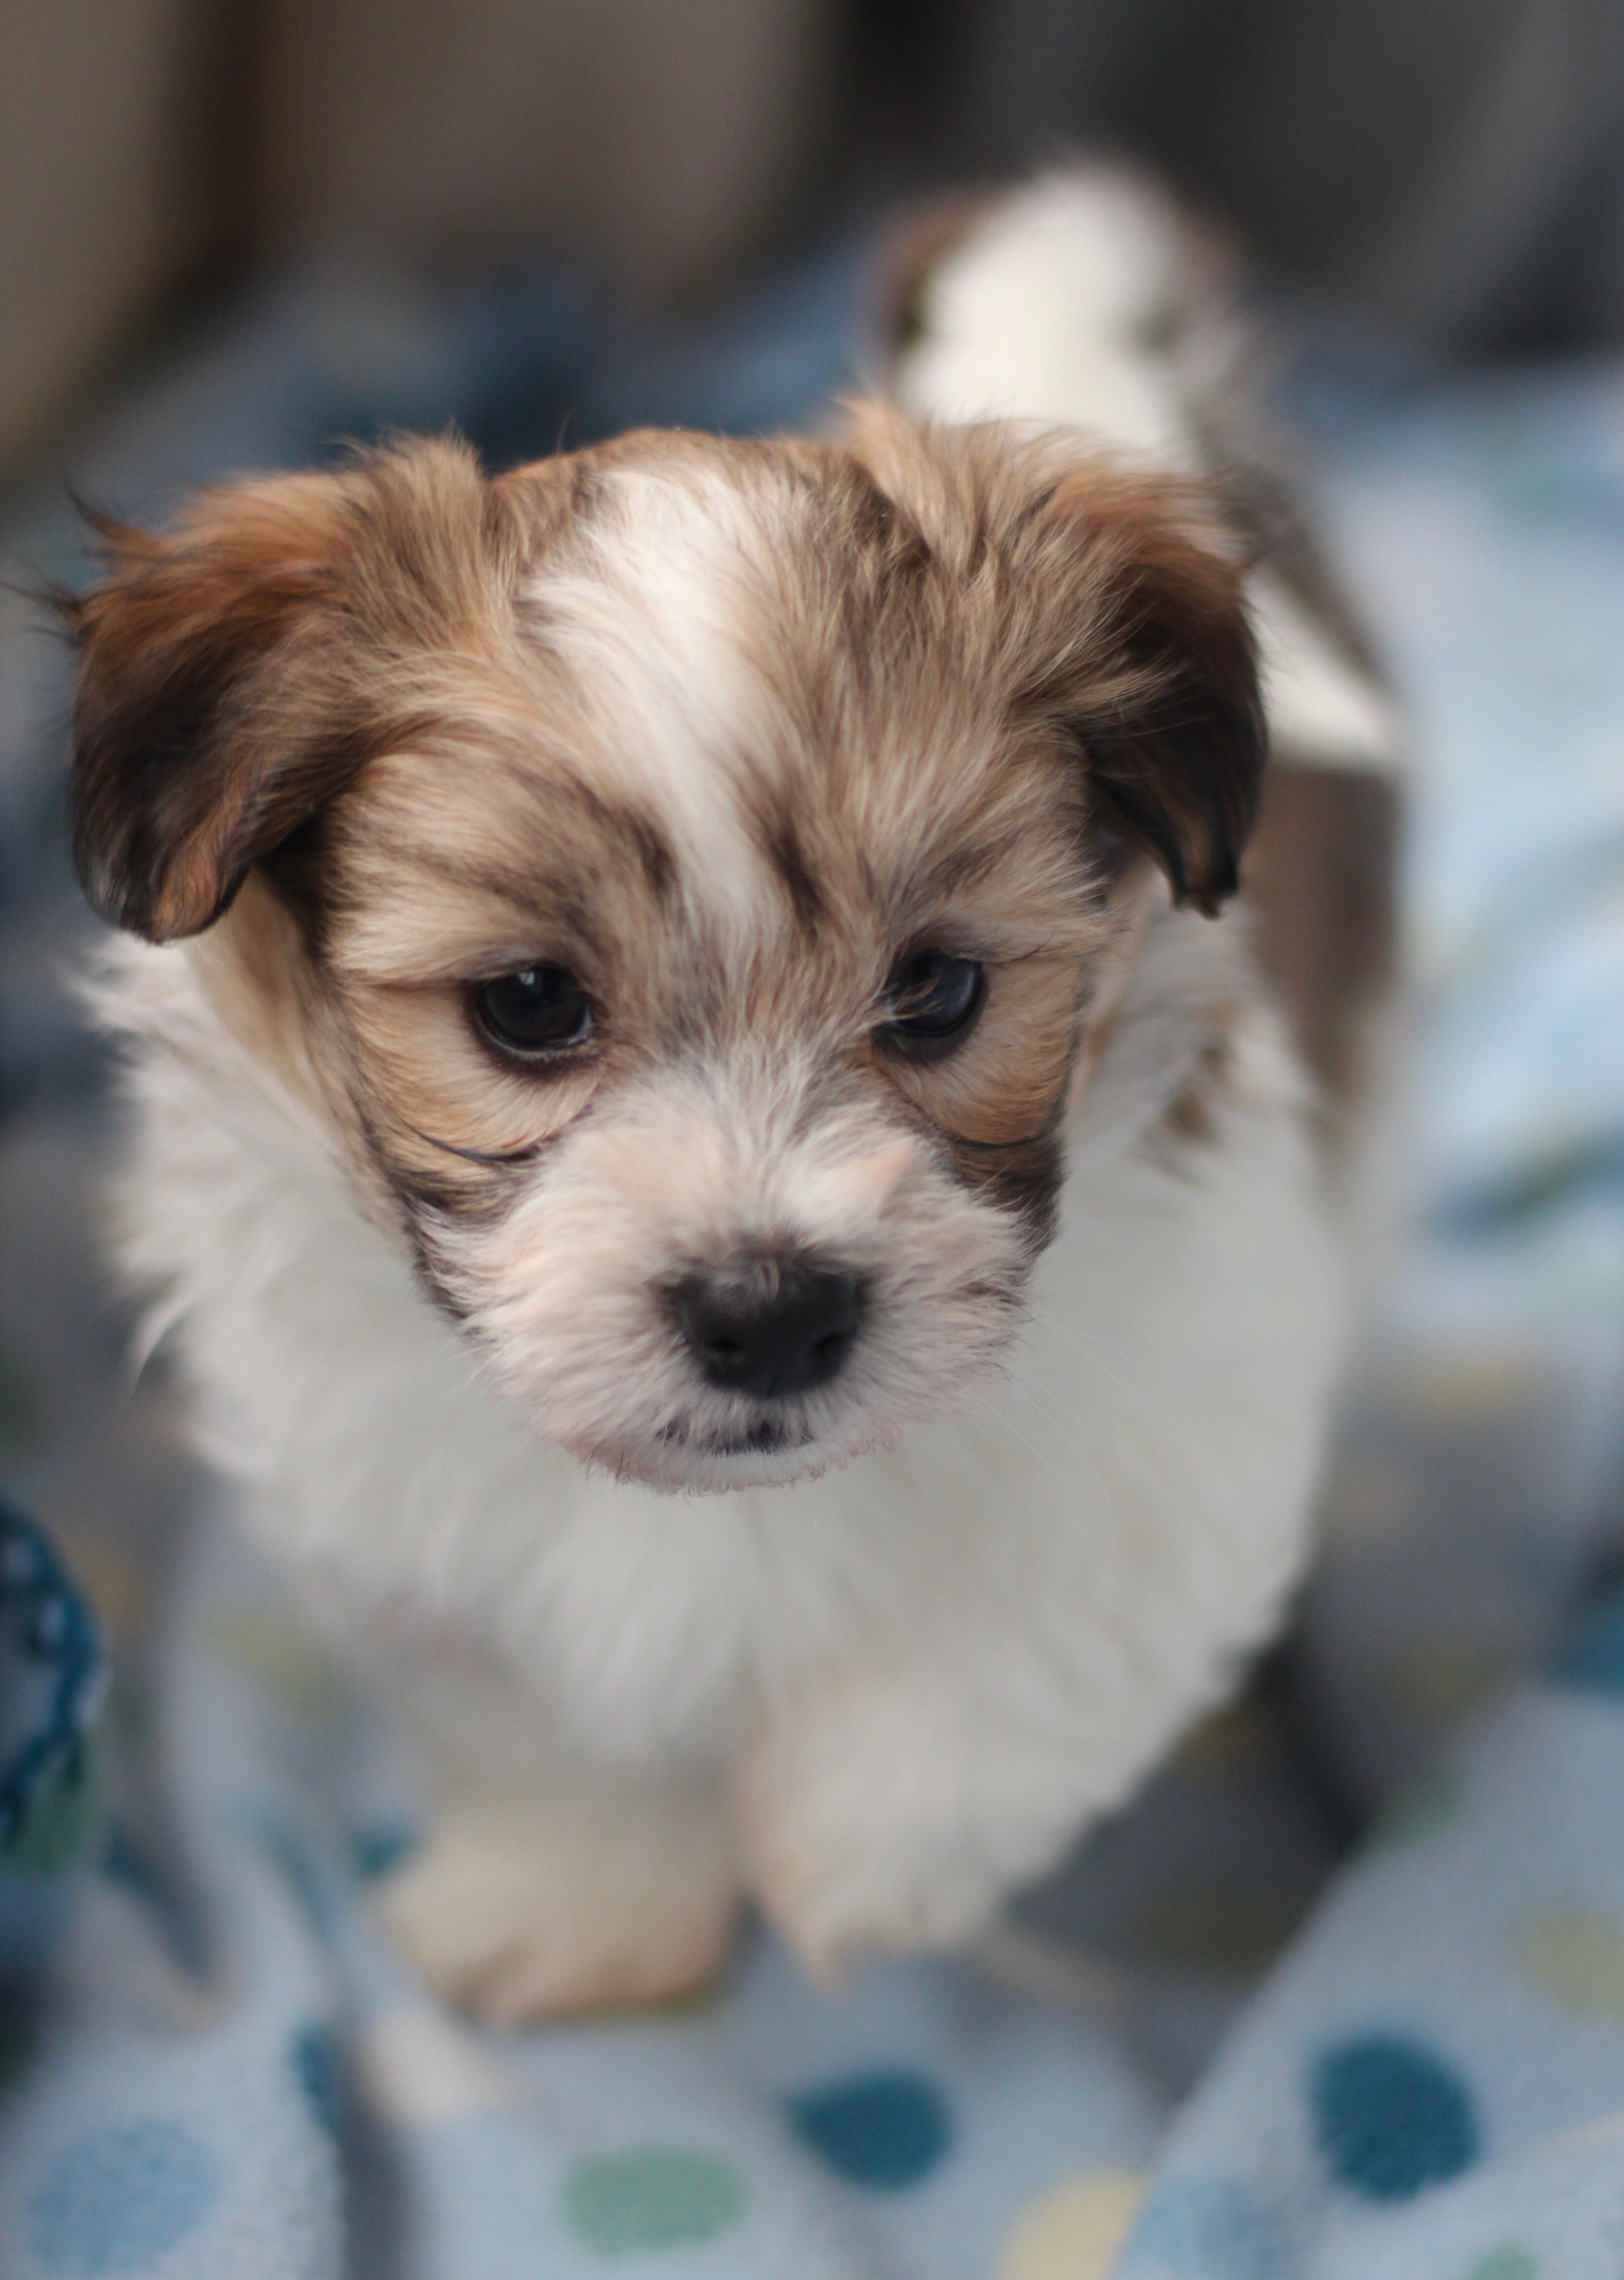 Our Sweet Bichon Shih Tzu Puppies Shichon Zuchon Happiness Www